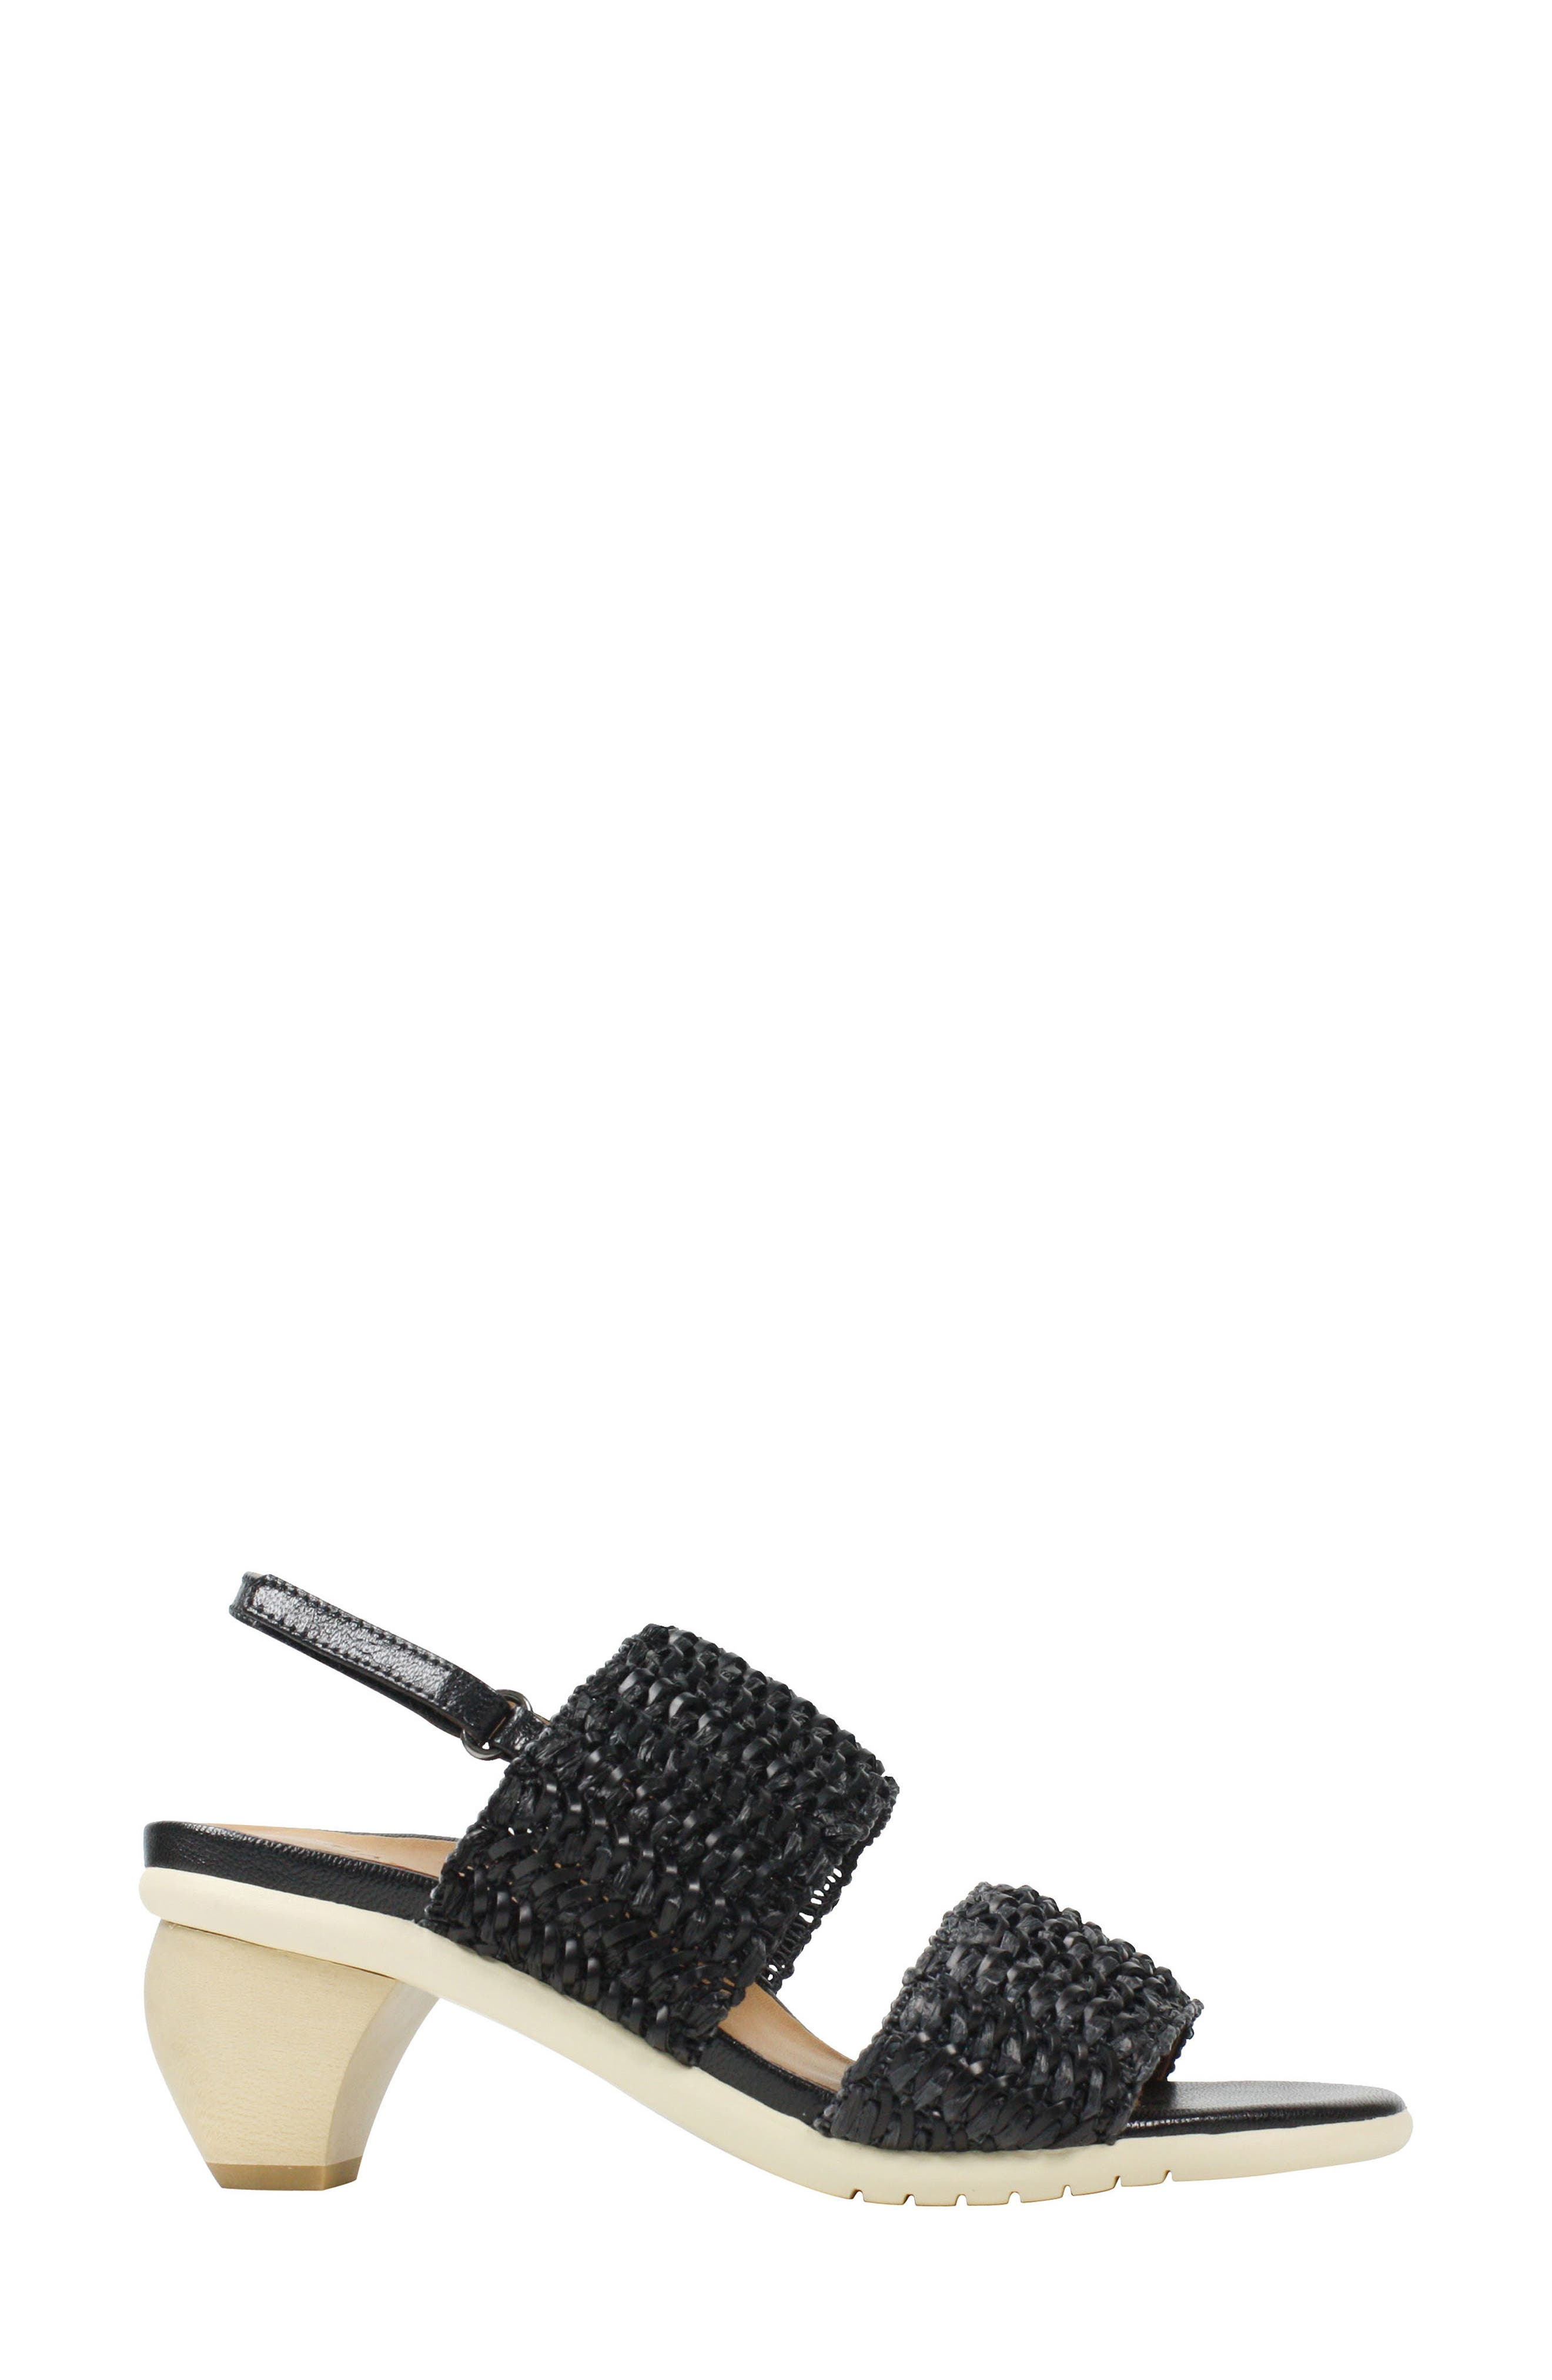 Ulrica Sandal,                             Alternate thumbnail 3, color,                             Black Fabric